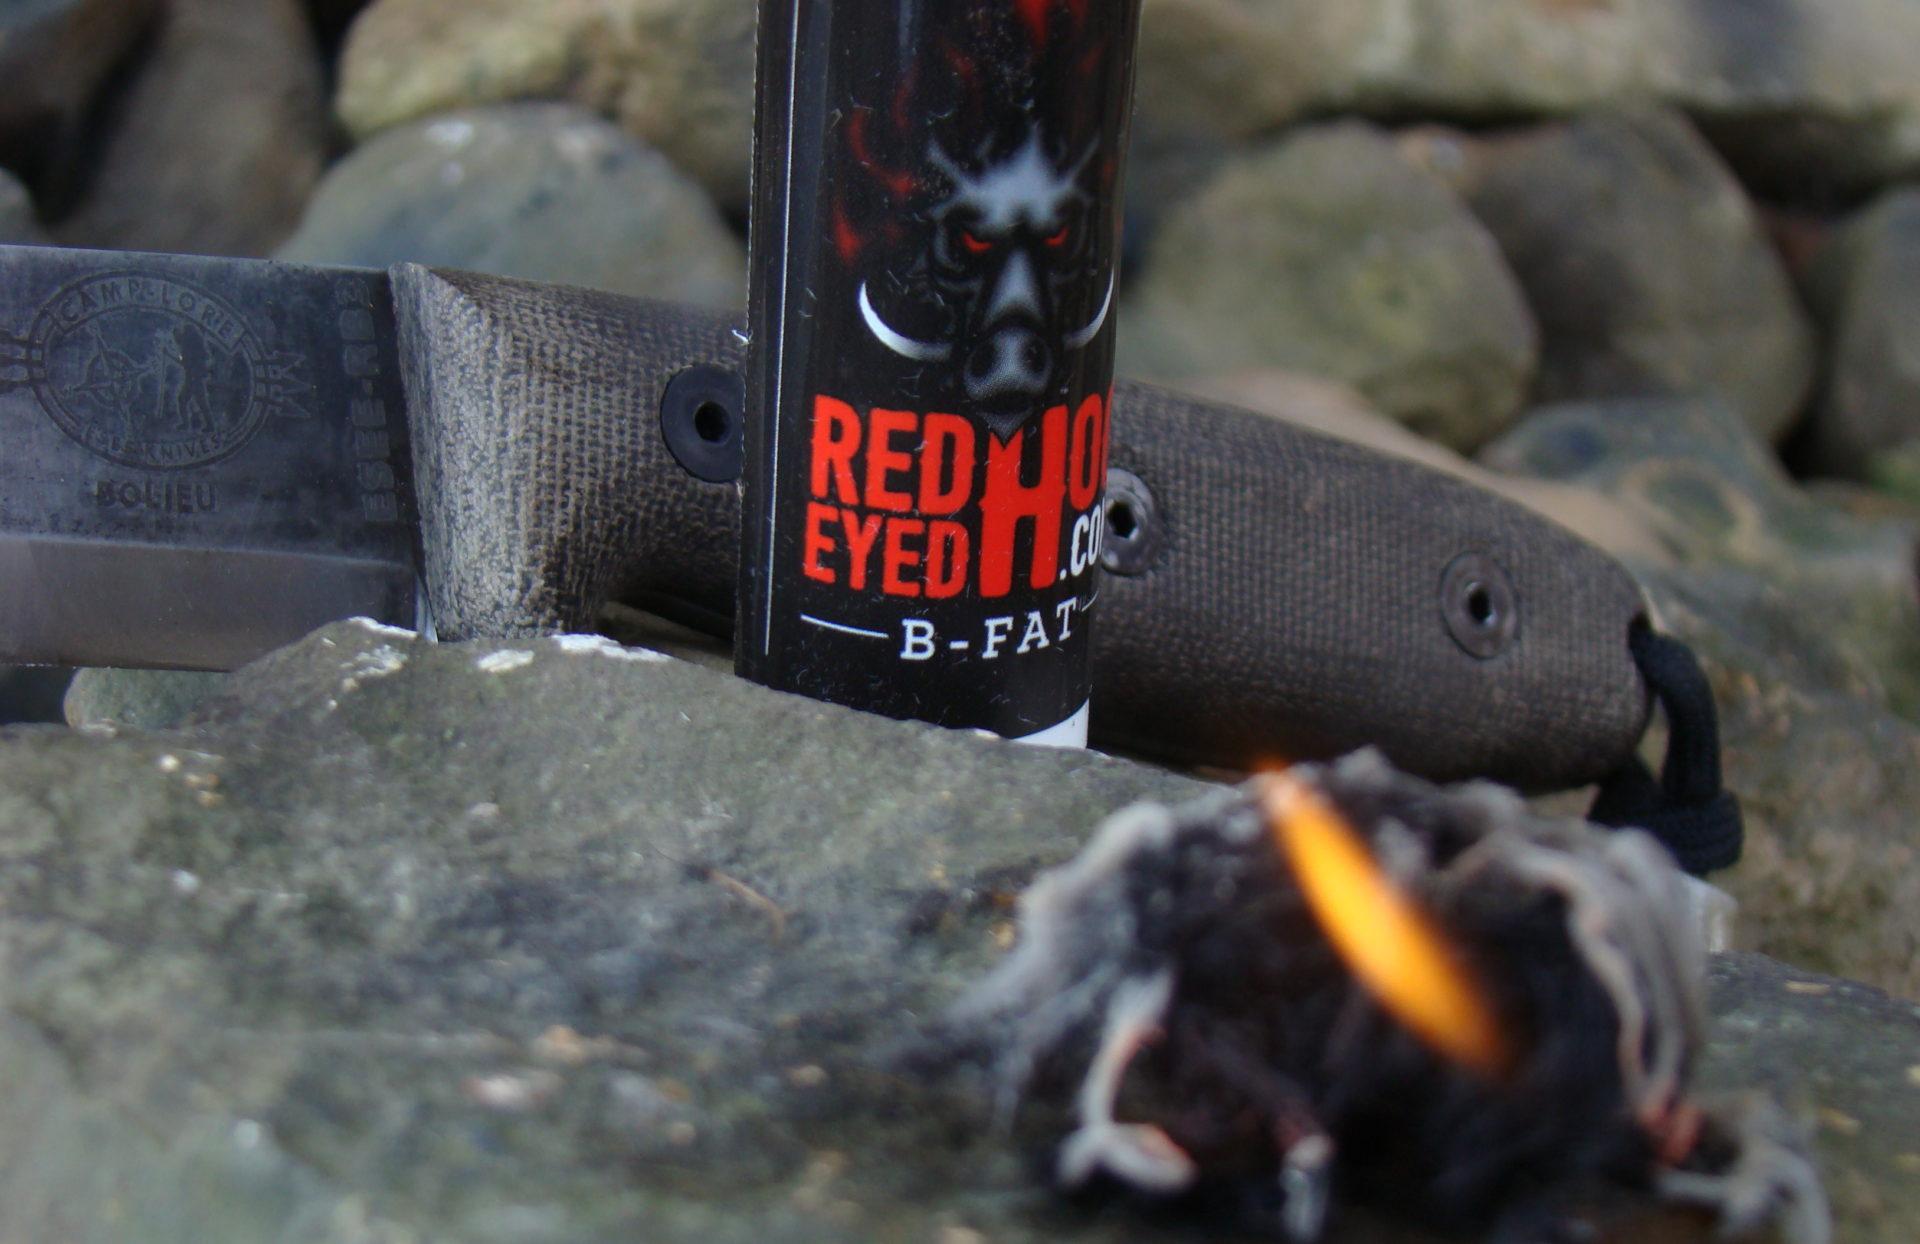 Red Eyed Hog